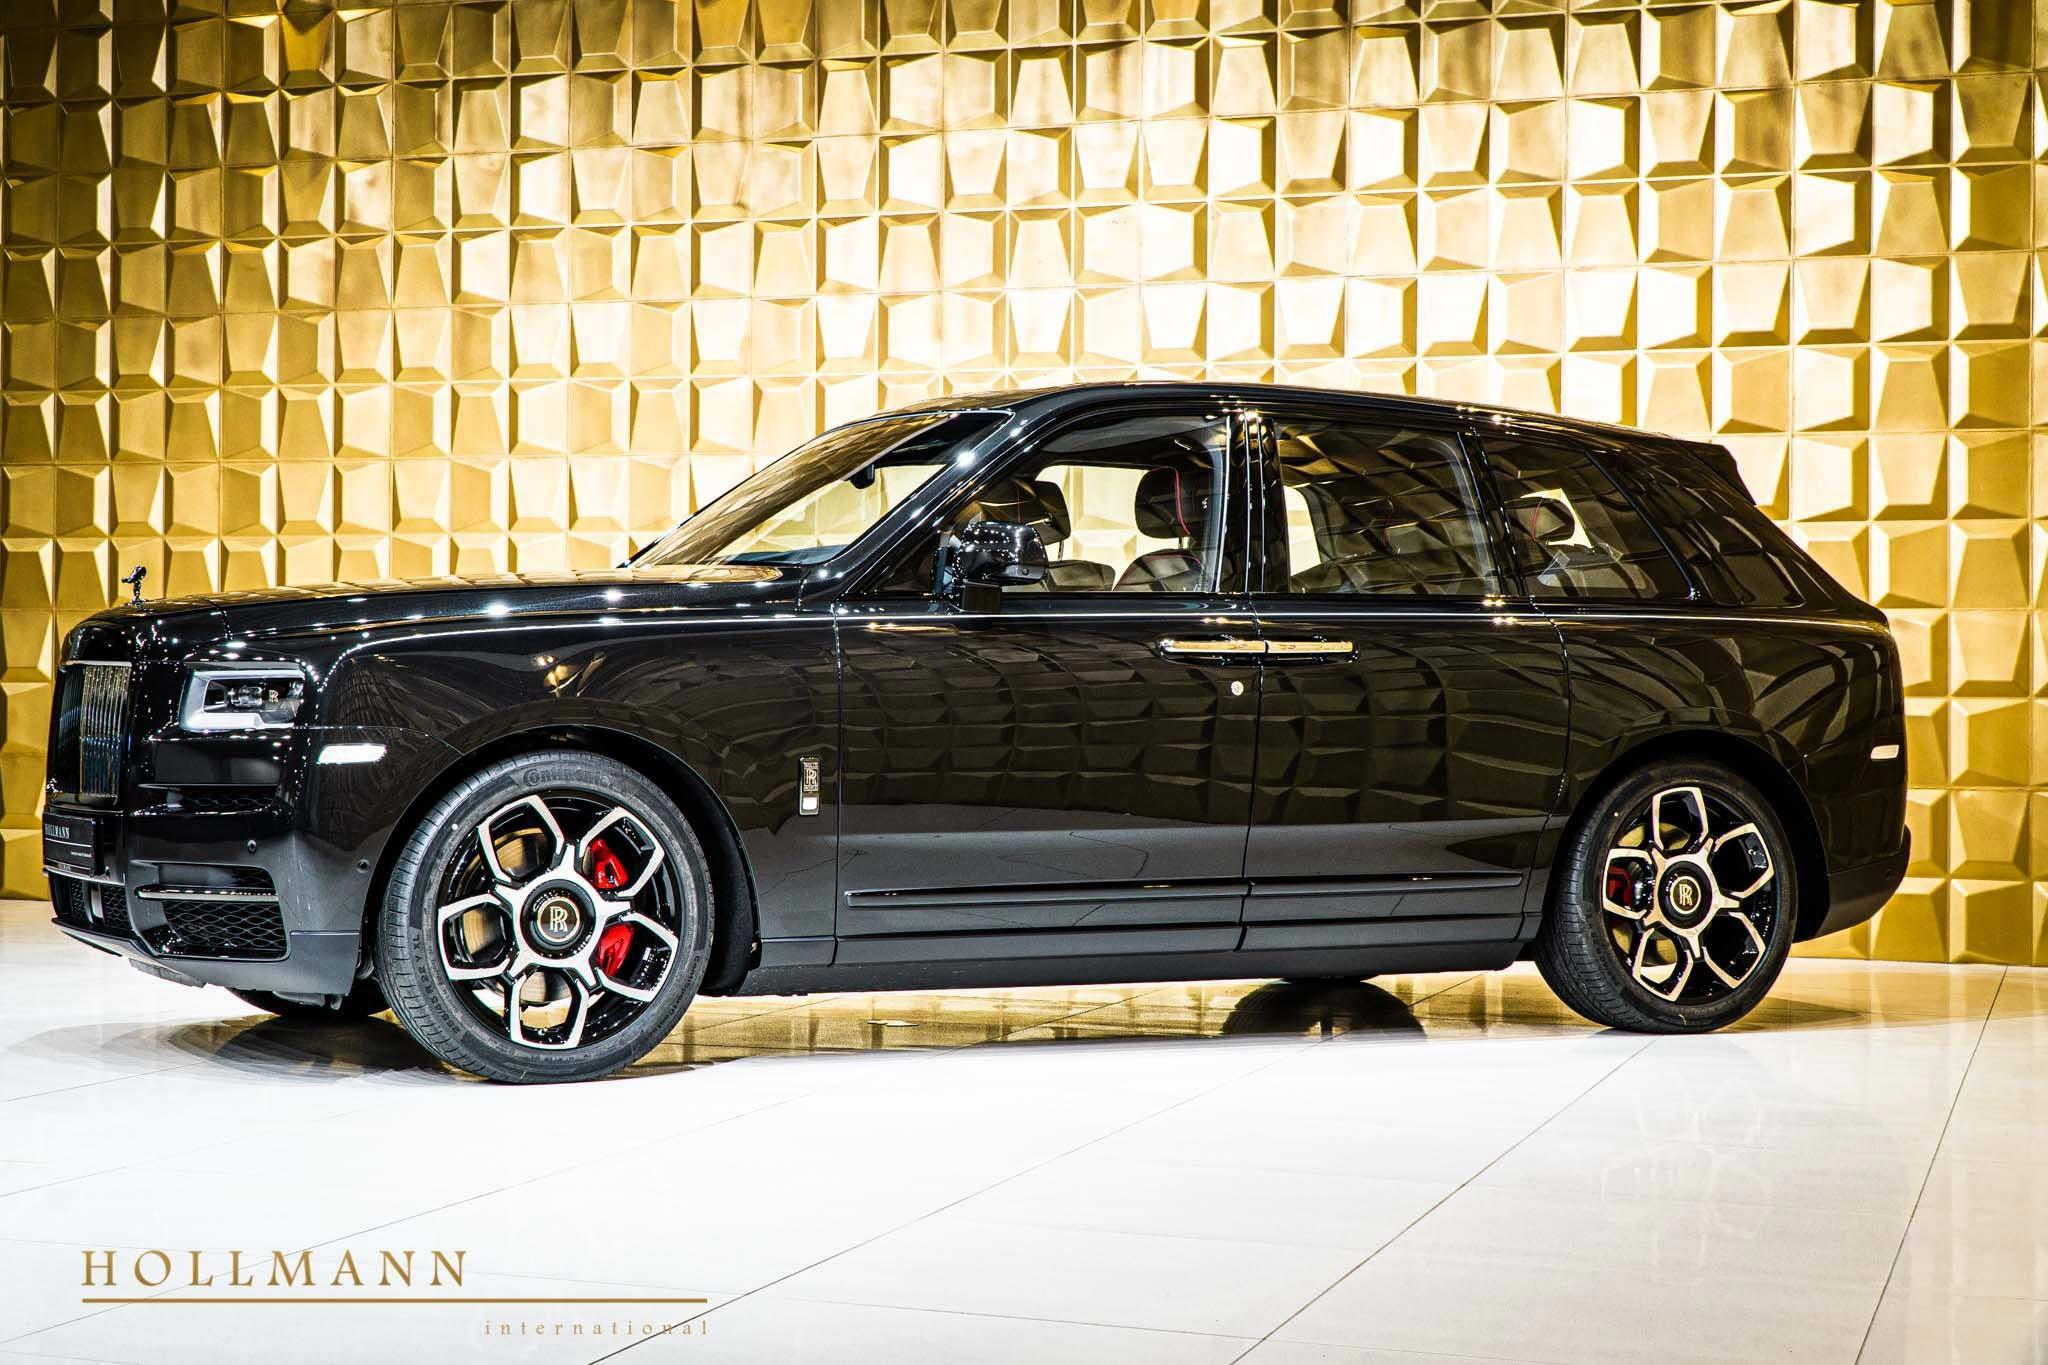 Rolls Royce Cullinan Black Badge Luxury Pulse Cars Germany For Sale On Luxurypulse